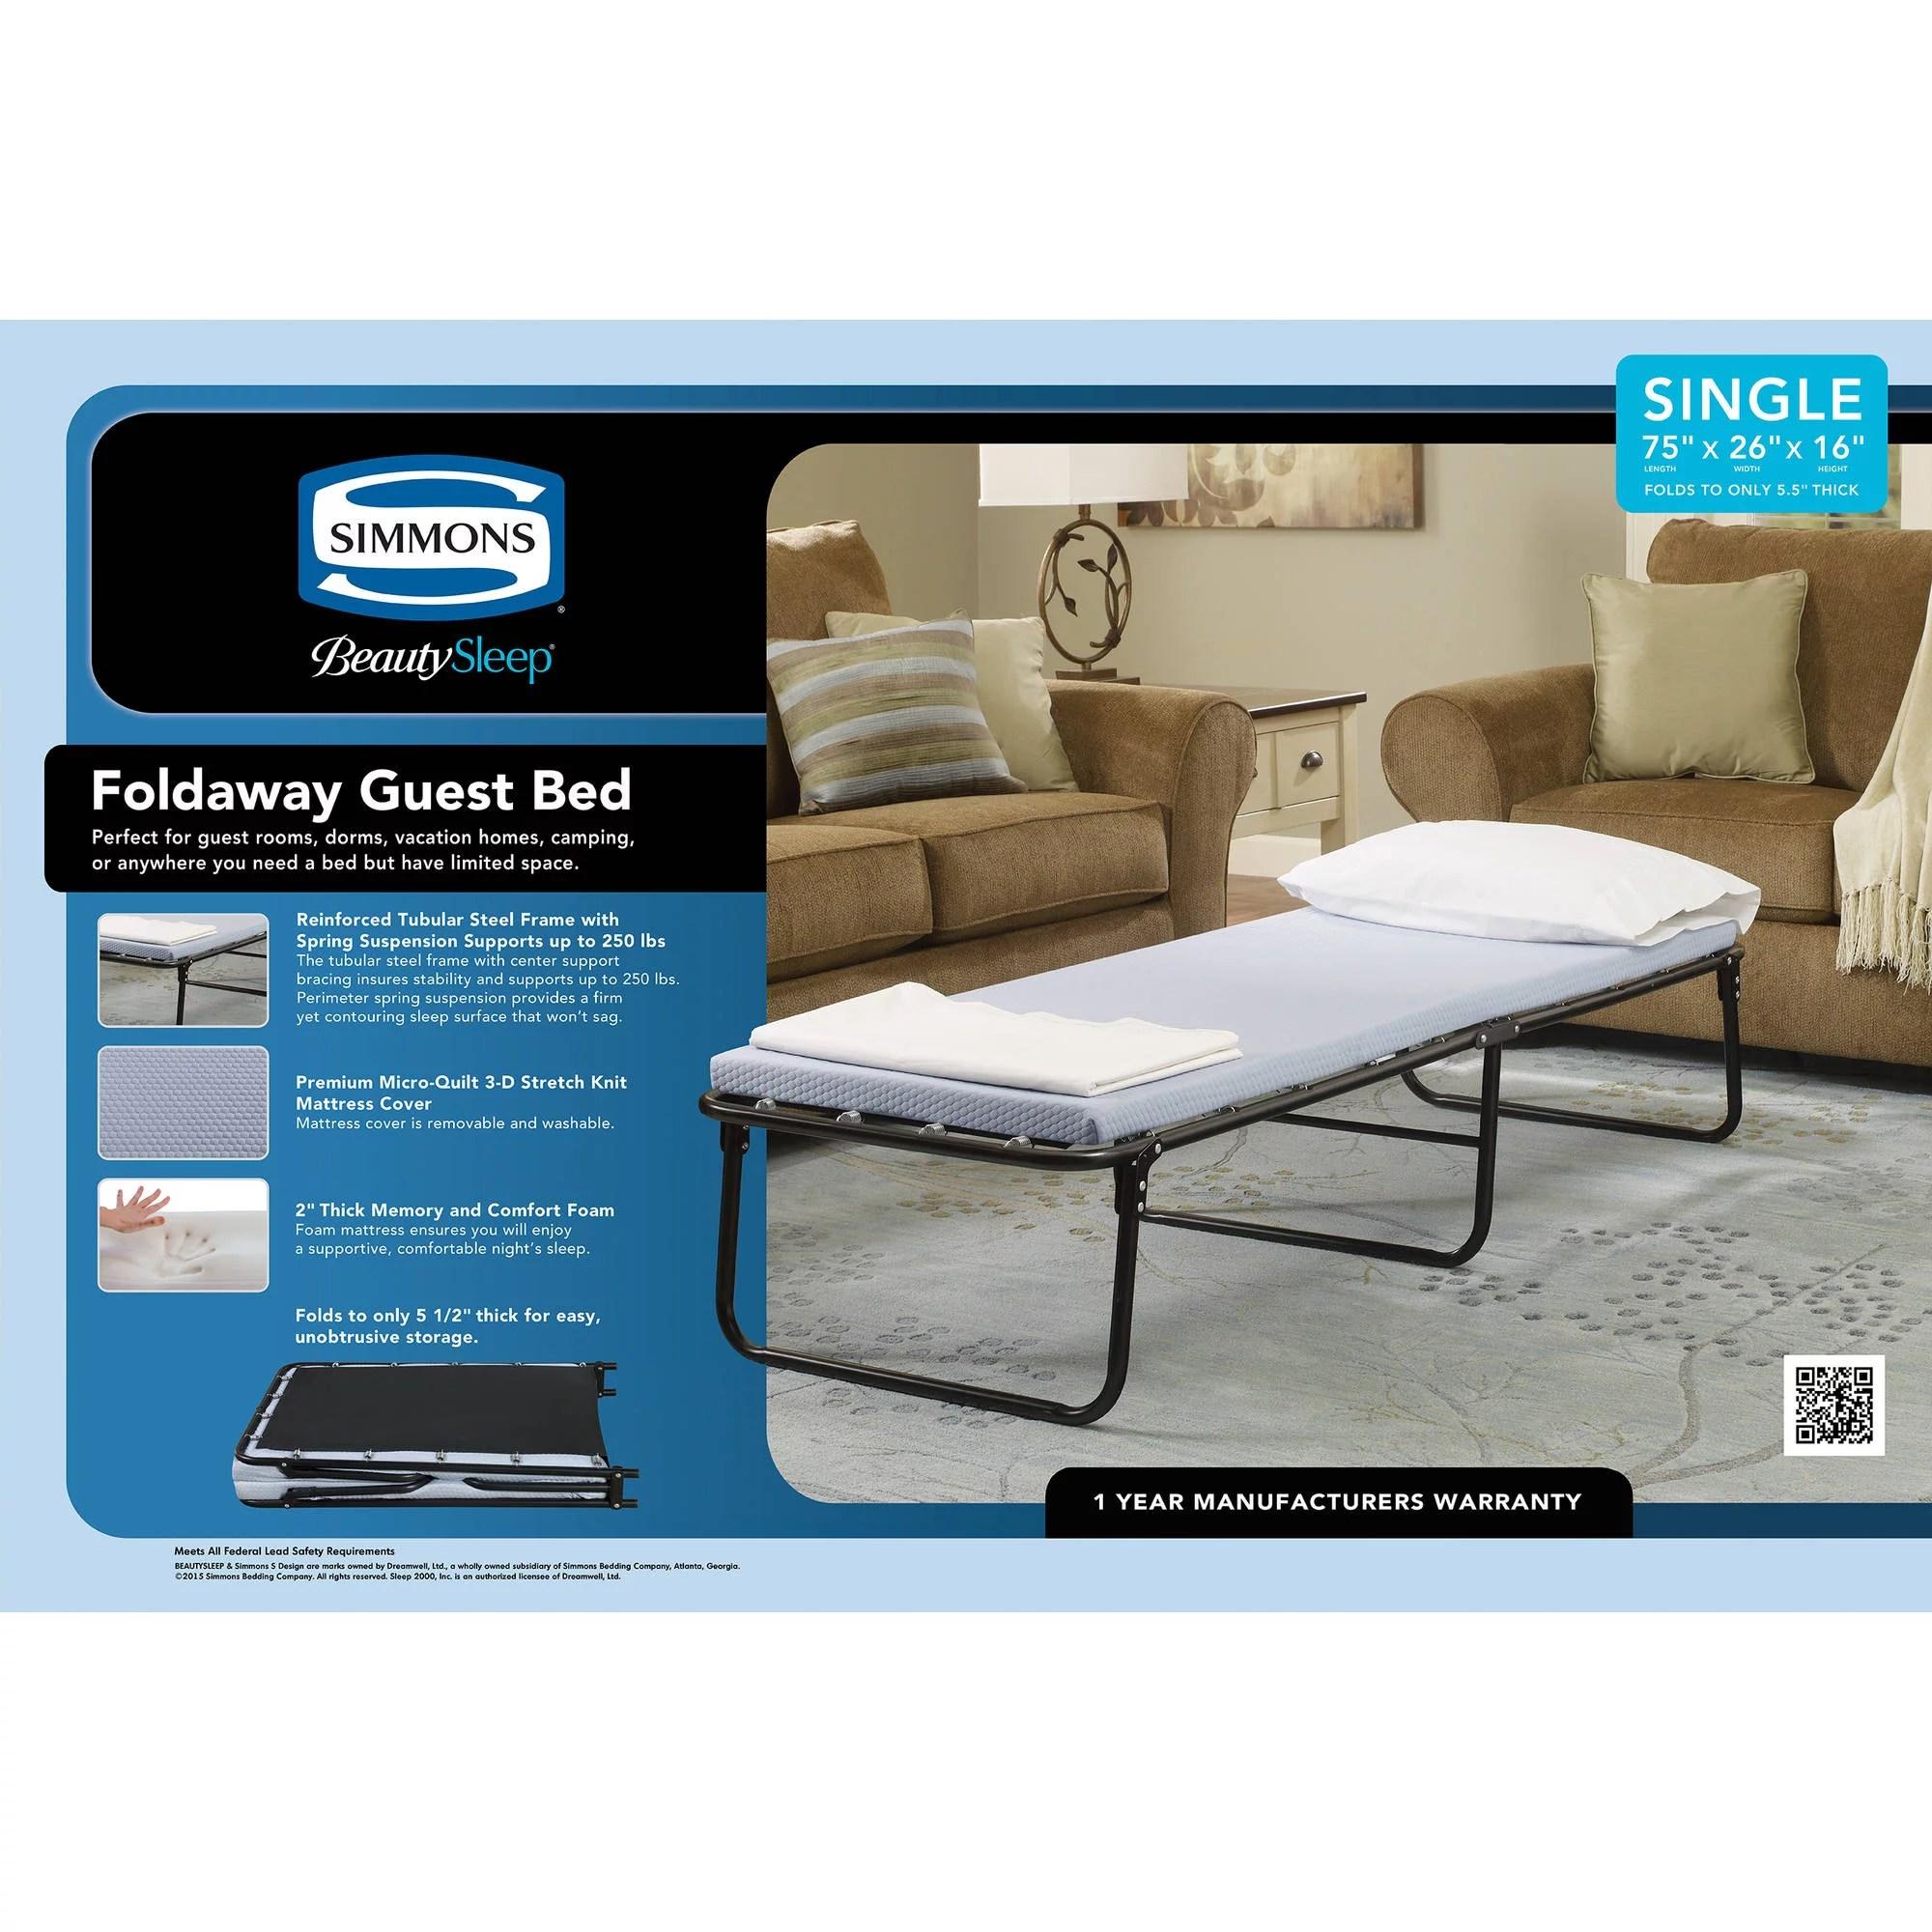 Futon Mattress Pad: How to Make It Comfortable?